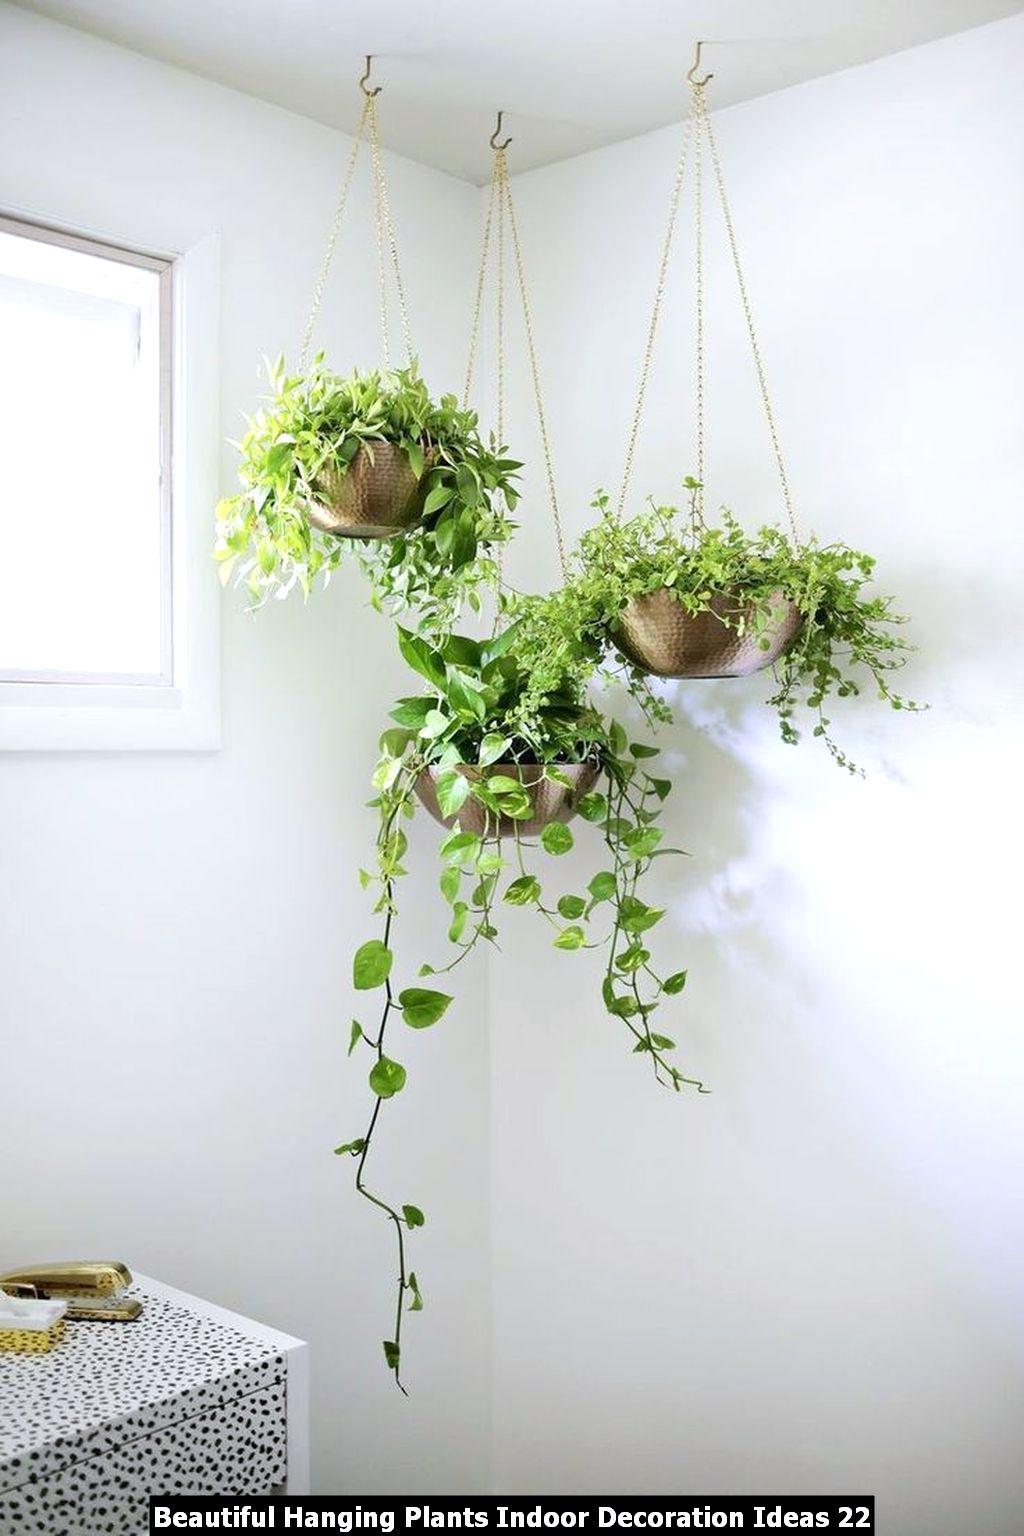 Beautiful Hanging Plants Indoor Decoration Ideas 22